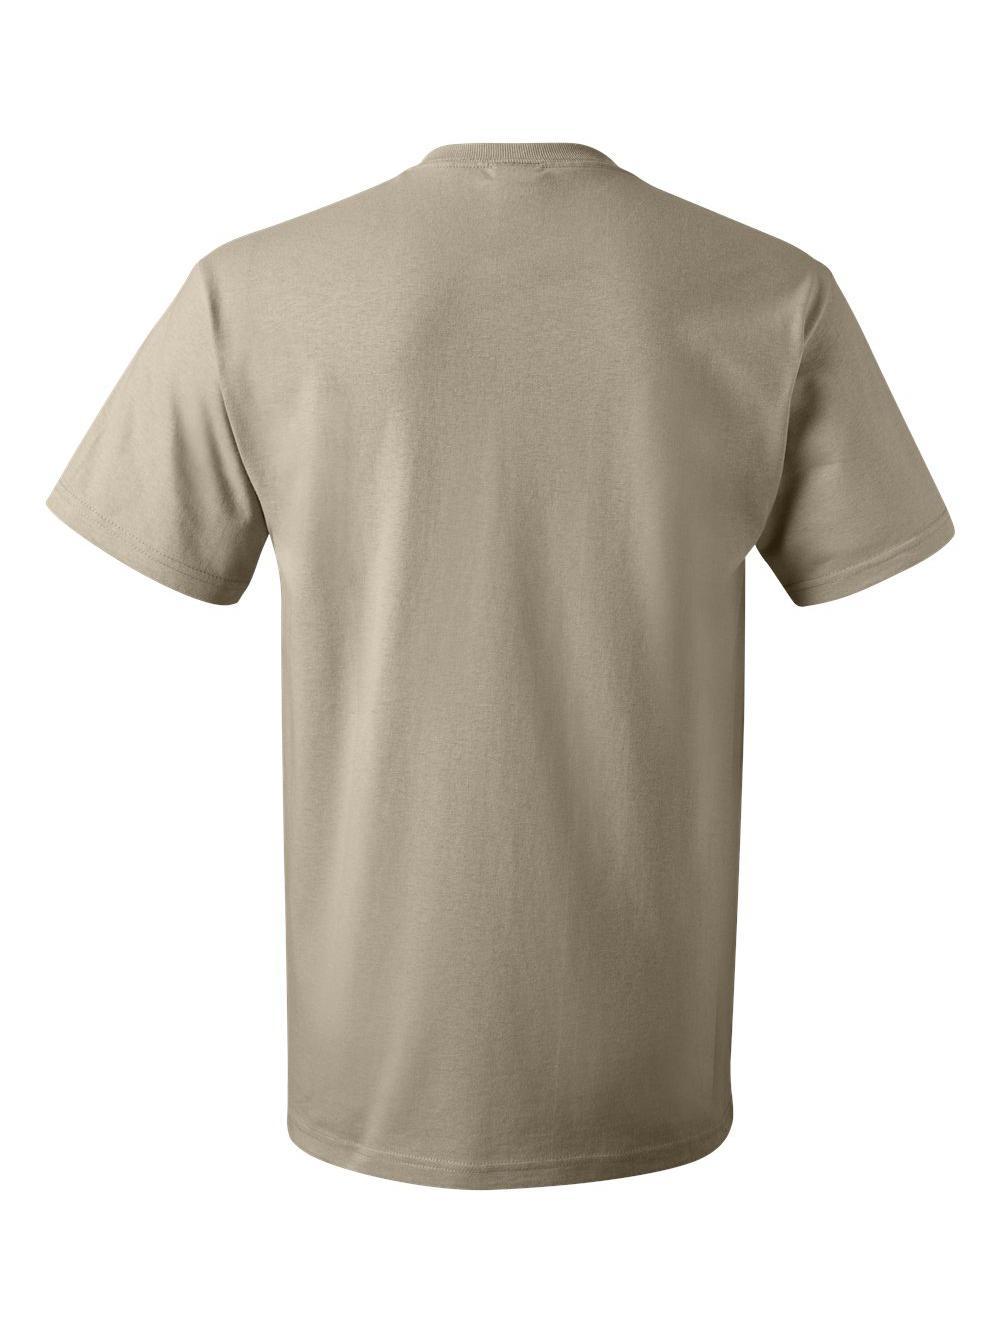 Fruit-of-the-Loom-HD-Cotton-Short-Sleeve-T-Shirt-3930R thumbnail 67